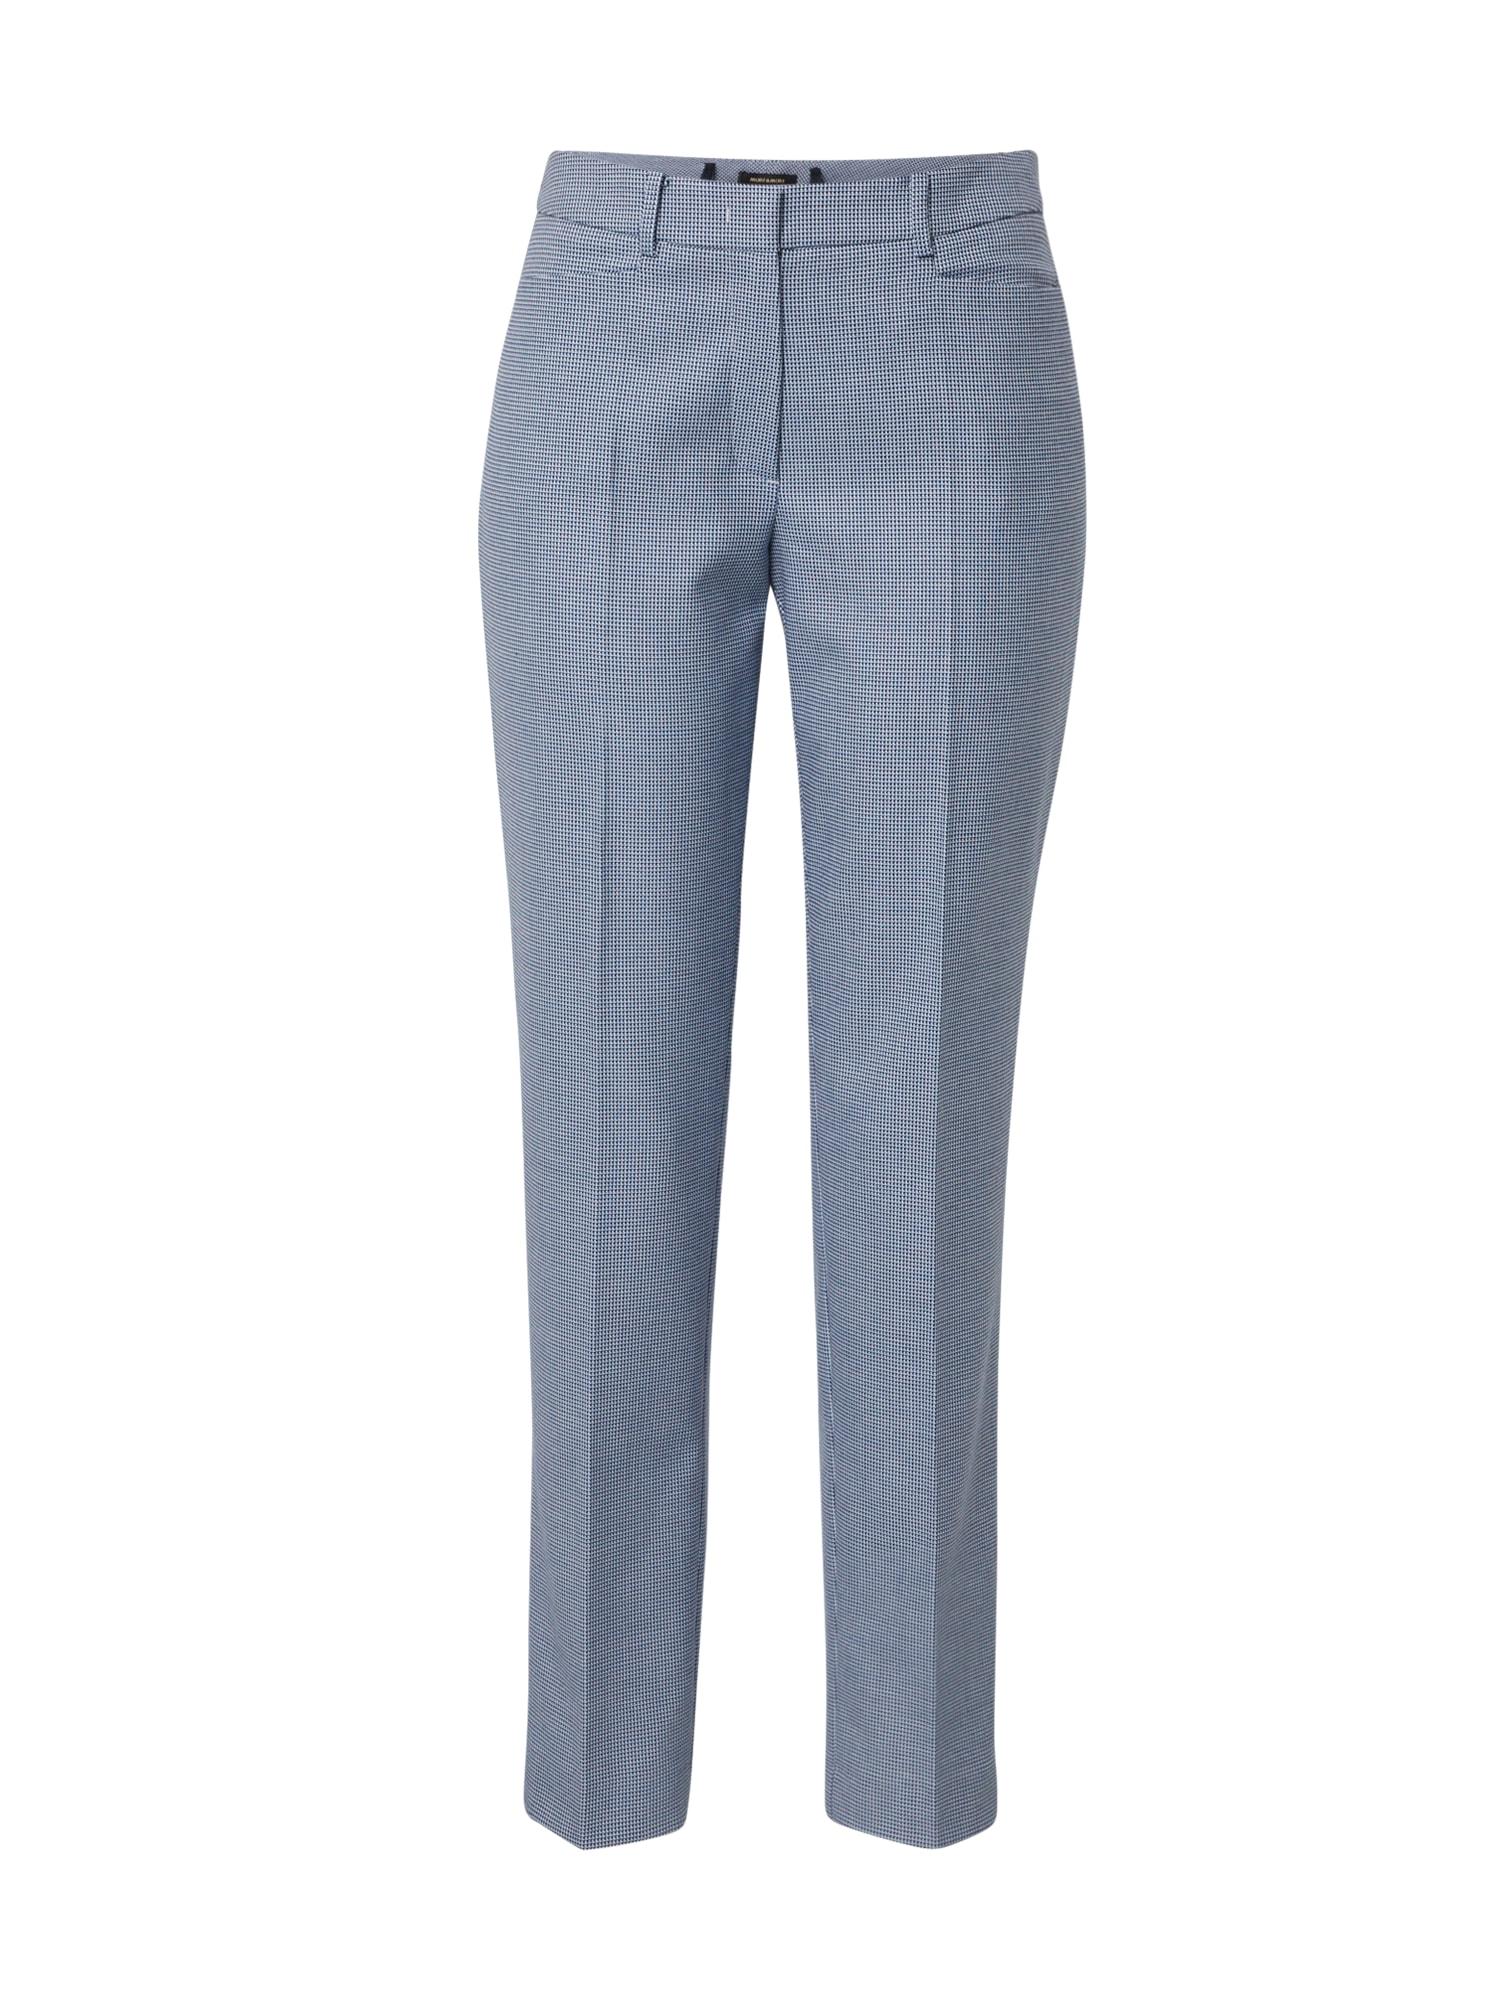 MORE & MORE Kelnės su kantu 'Hedy' melsvai pilka